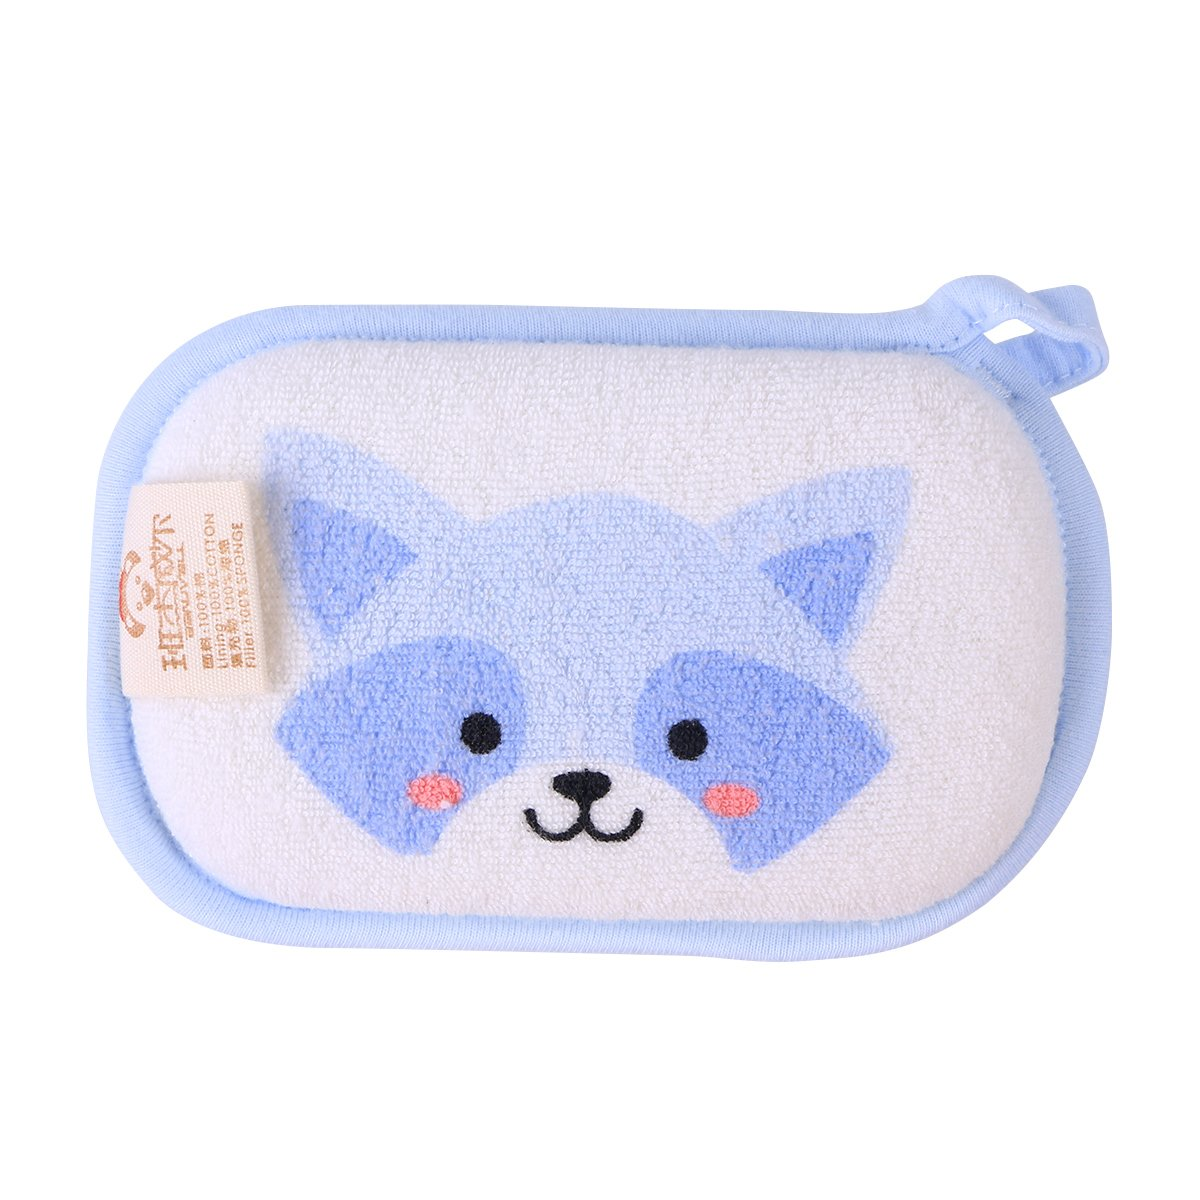 ounona Baby Bath Sponge天然ソフトコットンブラシRubシャワースポンジCartoon Coati B07F16B9RV